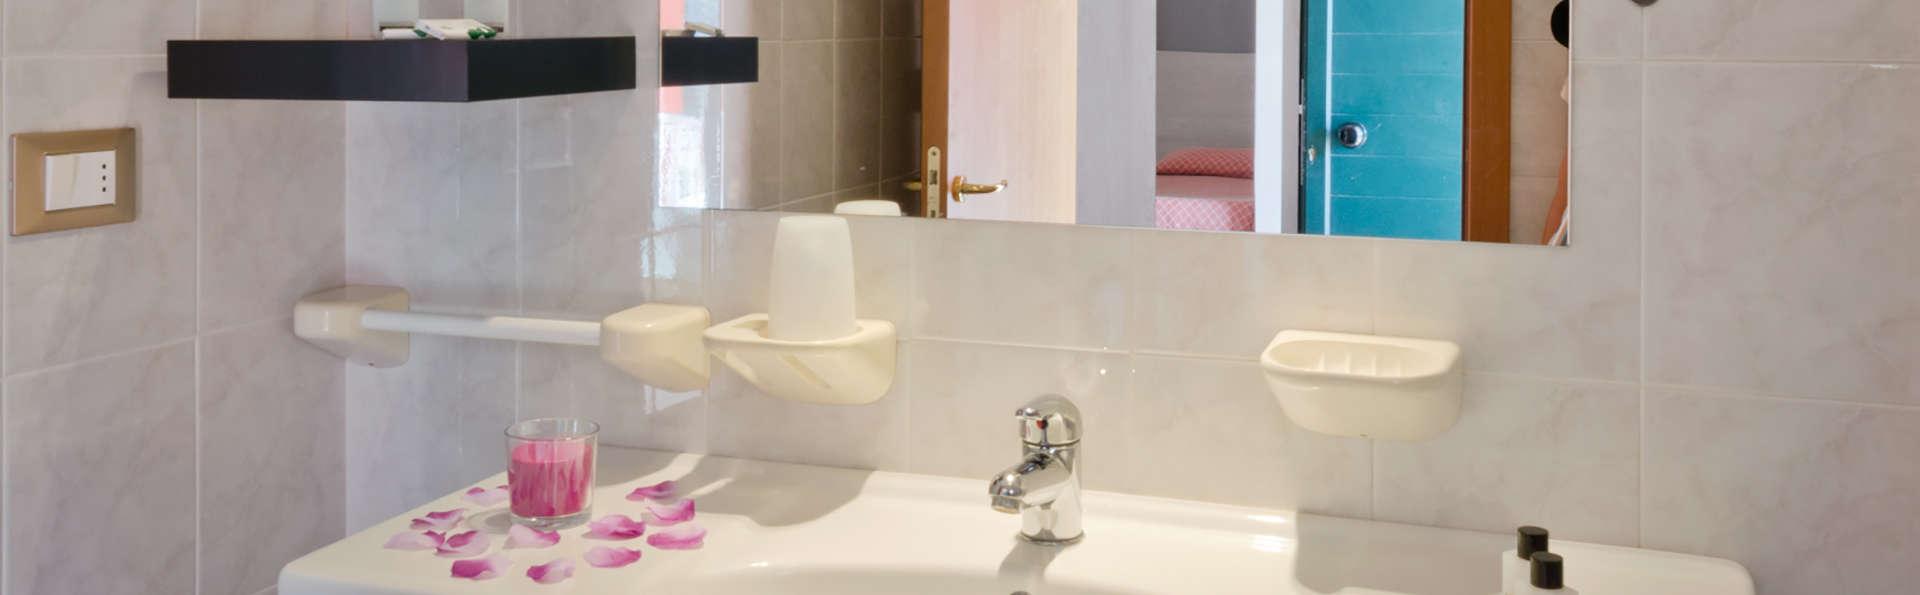 Hotel Le Muse - EDIT_NEW_BATHROOM.jpg